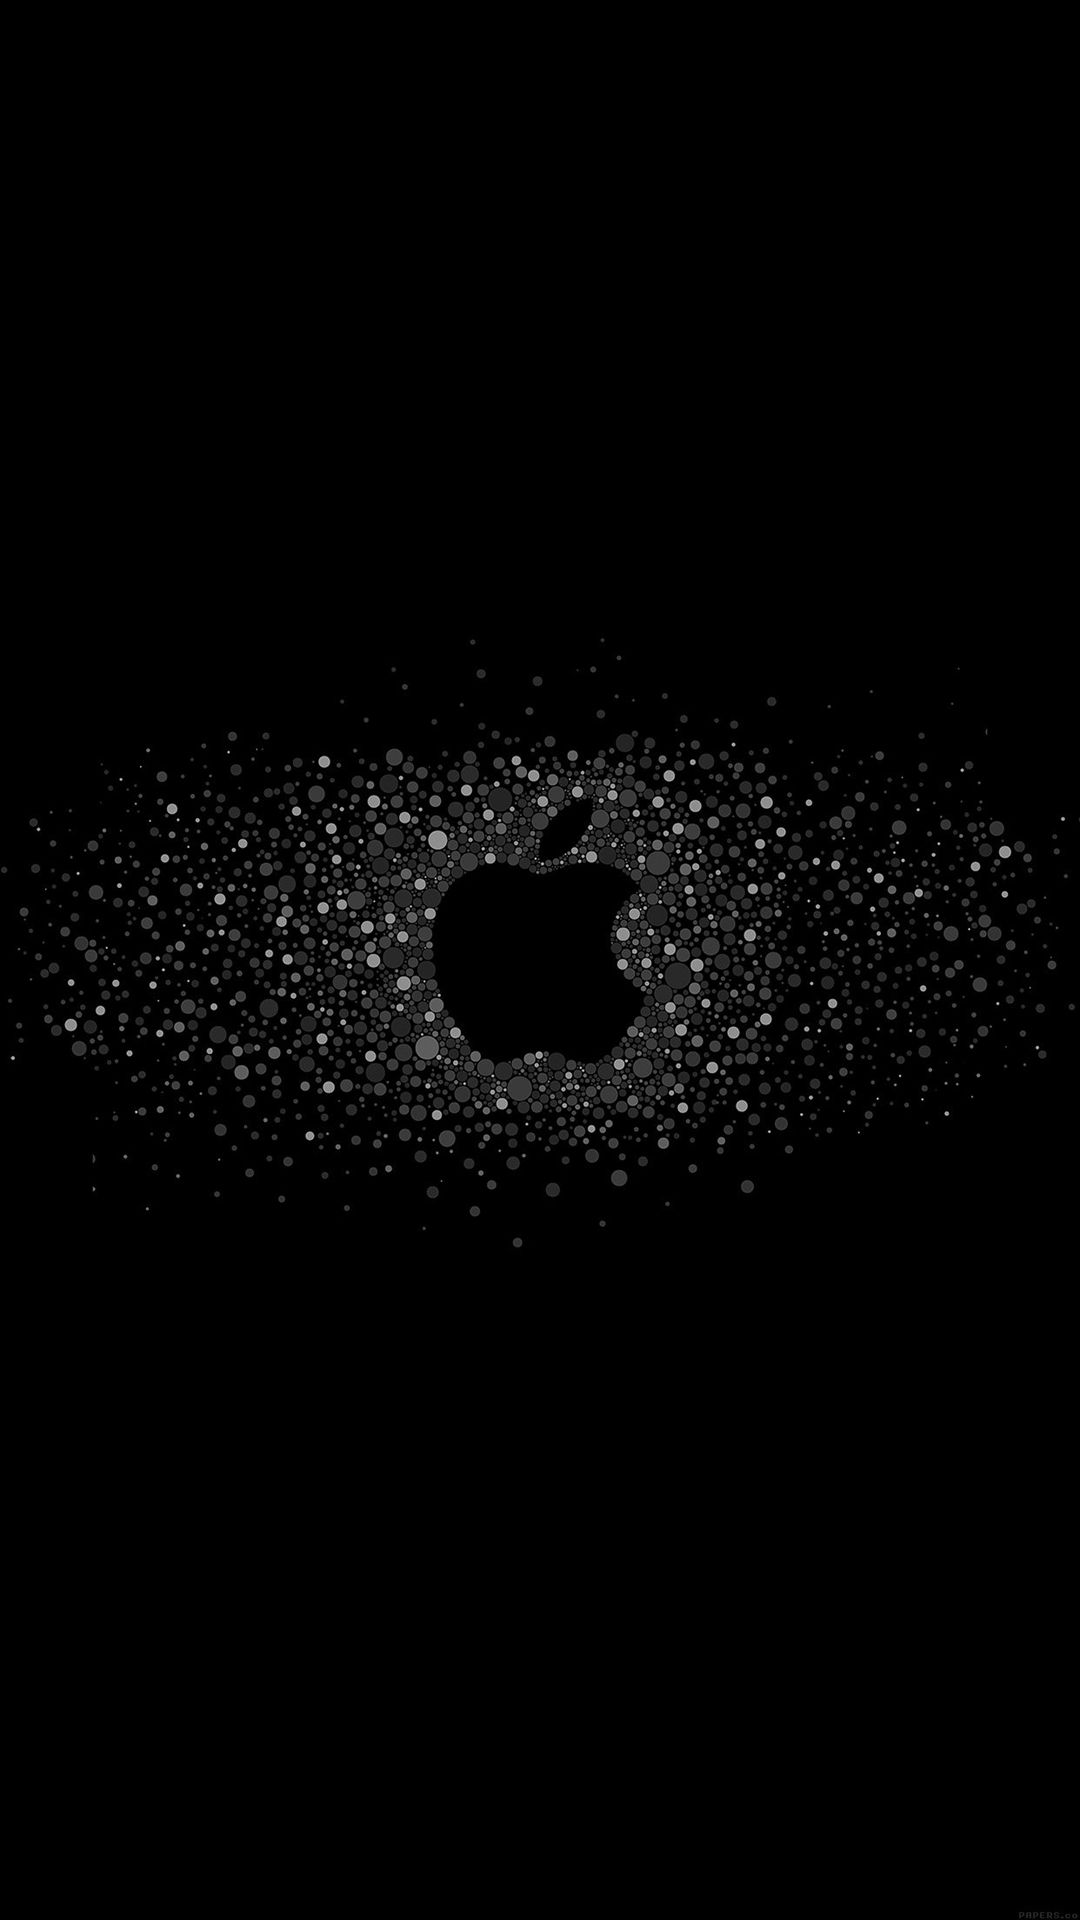 Logo Art Apple Rainbow Minimal Dark Iphone 6 Plus Wallpaper Apple Wallpaper Iphone Apple Logo Wallpaper Iphone Black Apple Wallpaper